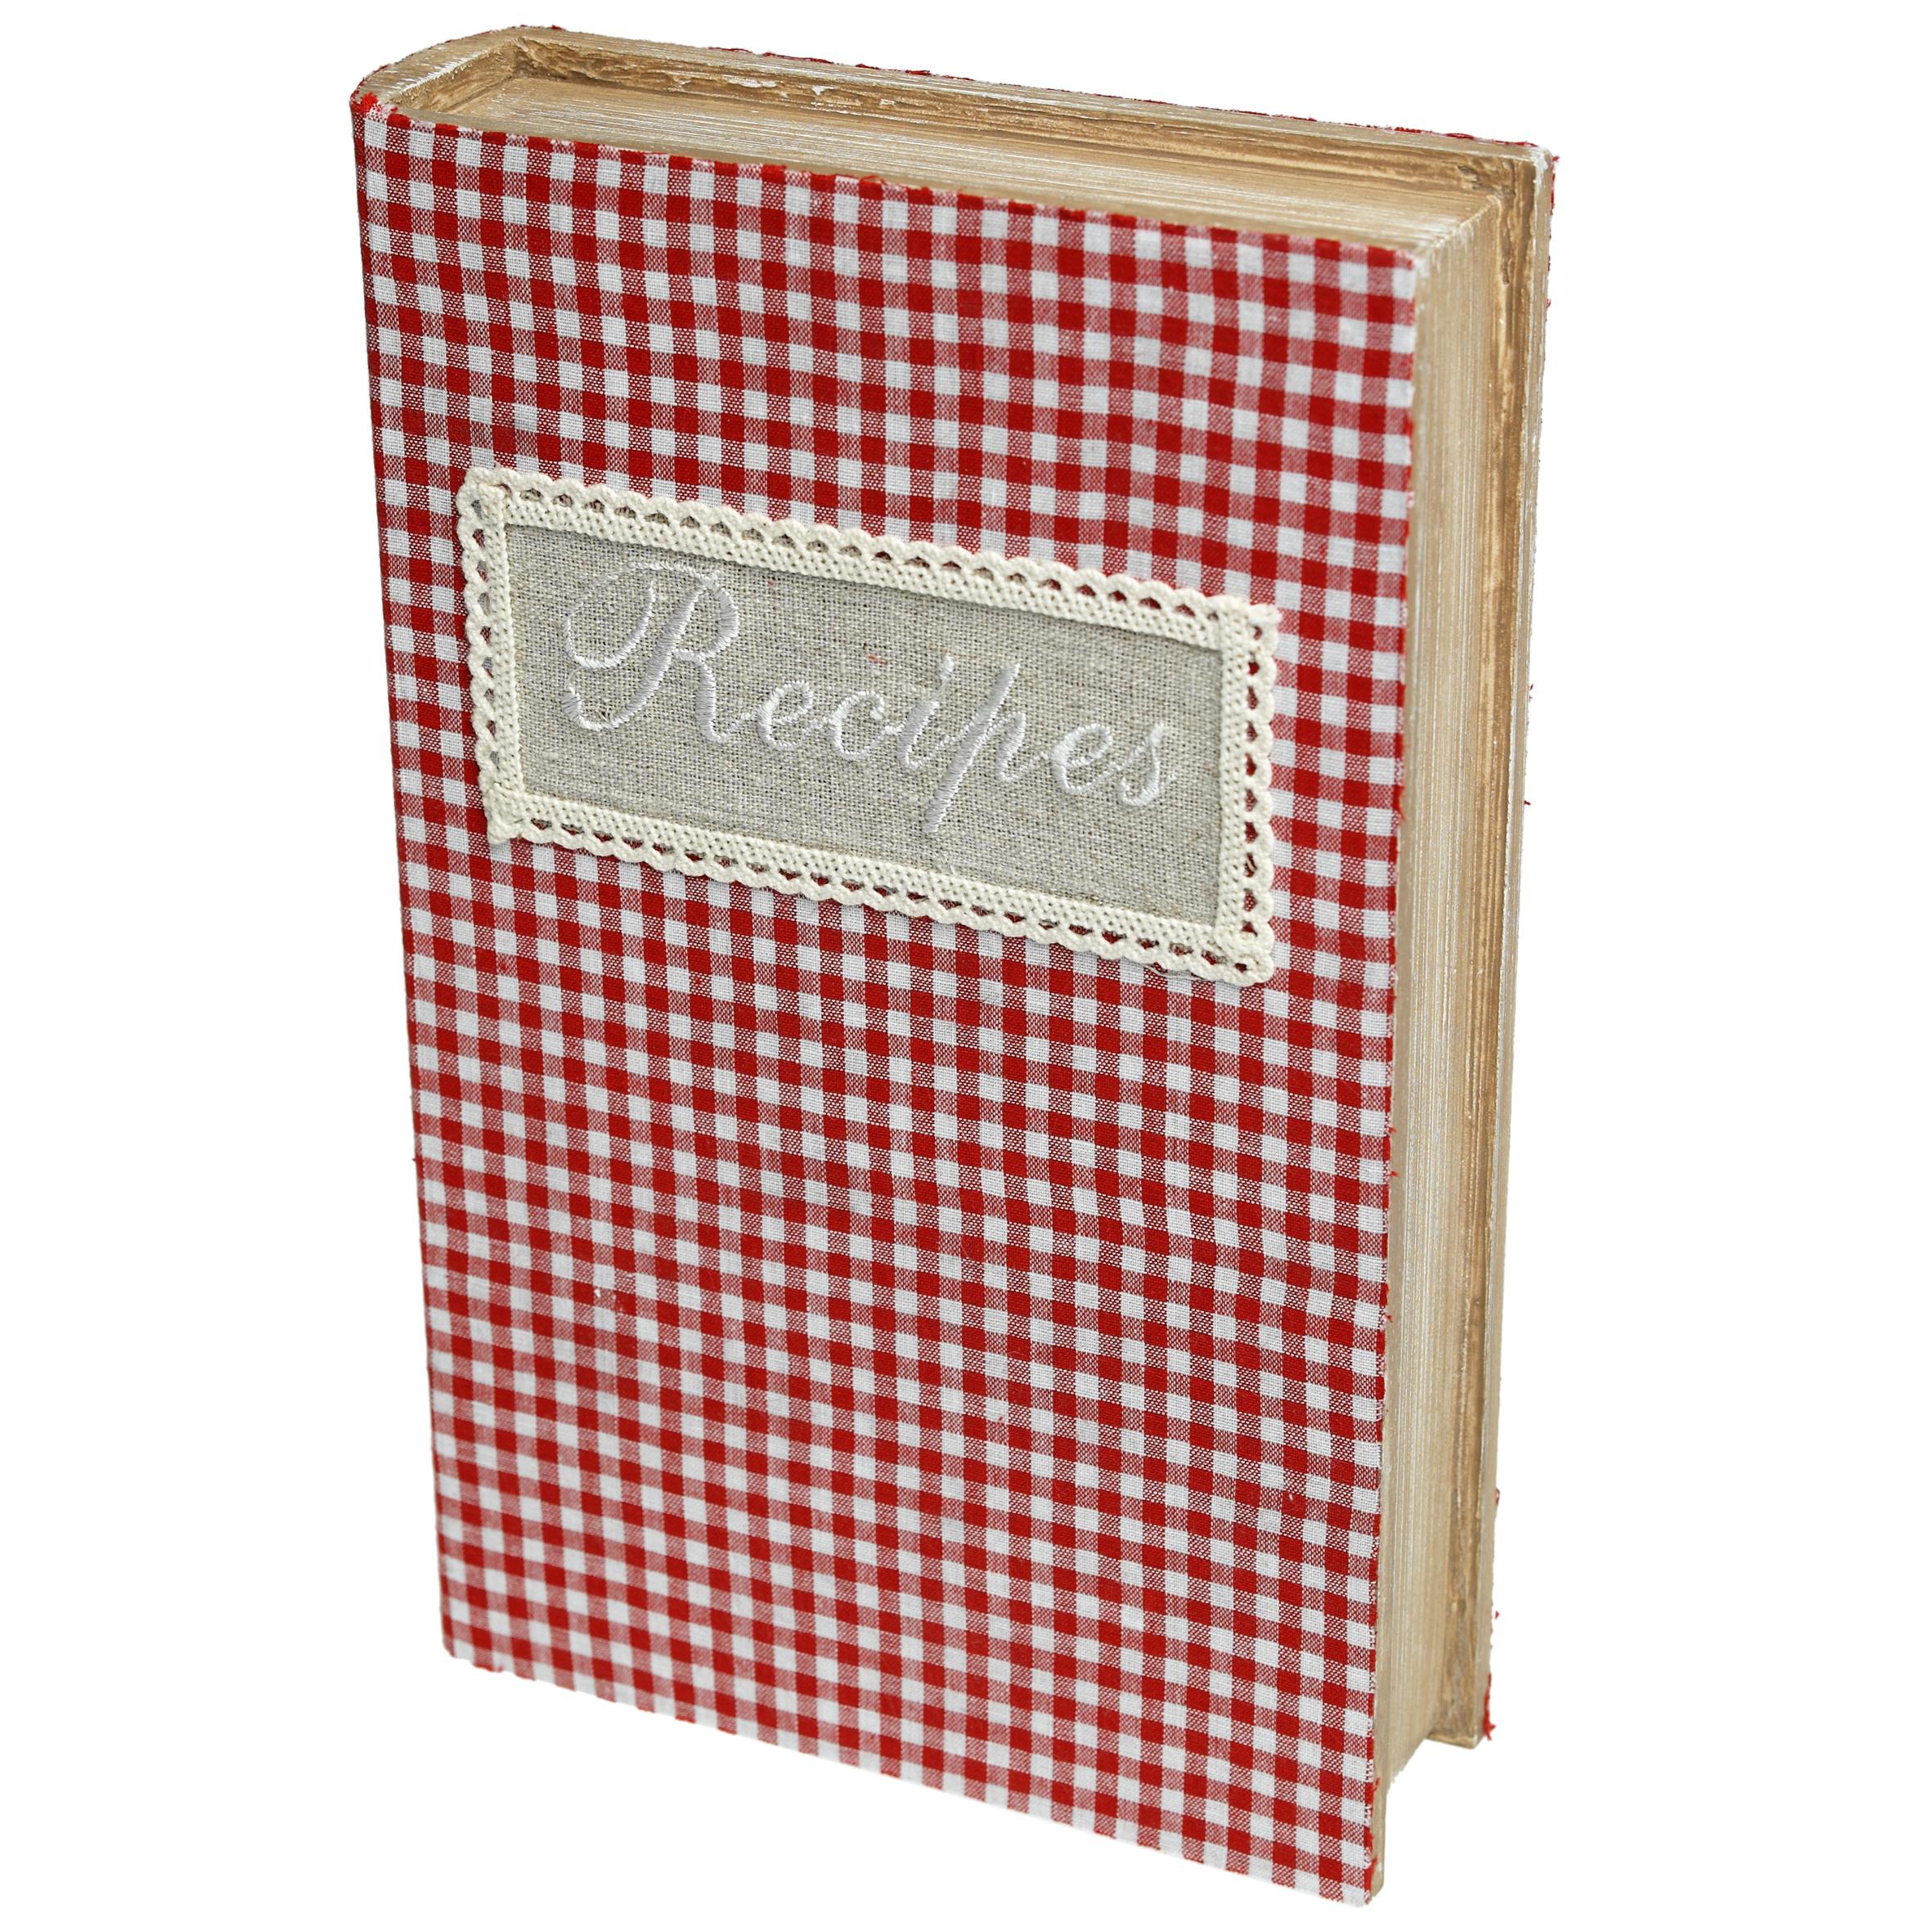 Recipe Book Storage Box  sc 1 st  Dotcomgiftshop & Gingham Recipe Book Storage Box | Rex London (dotcomgiftshop)